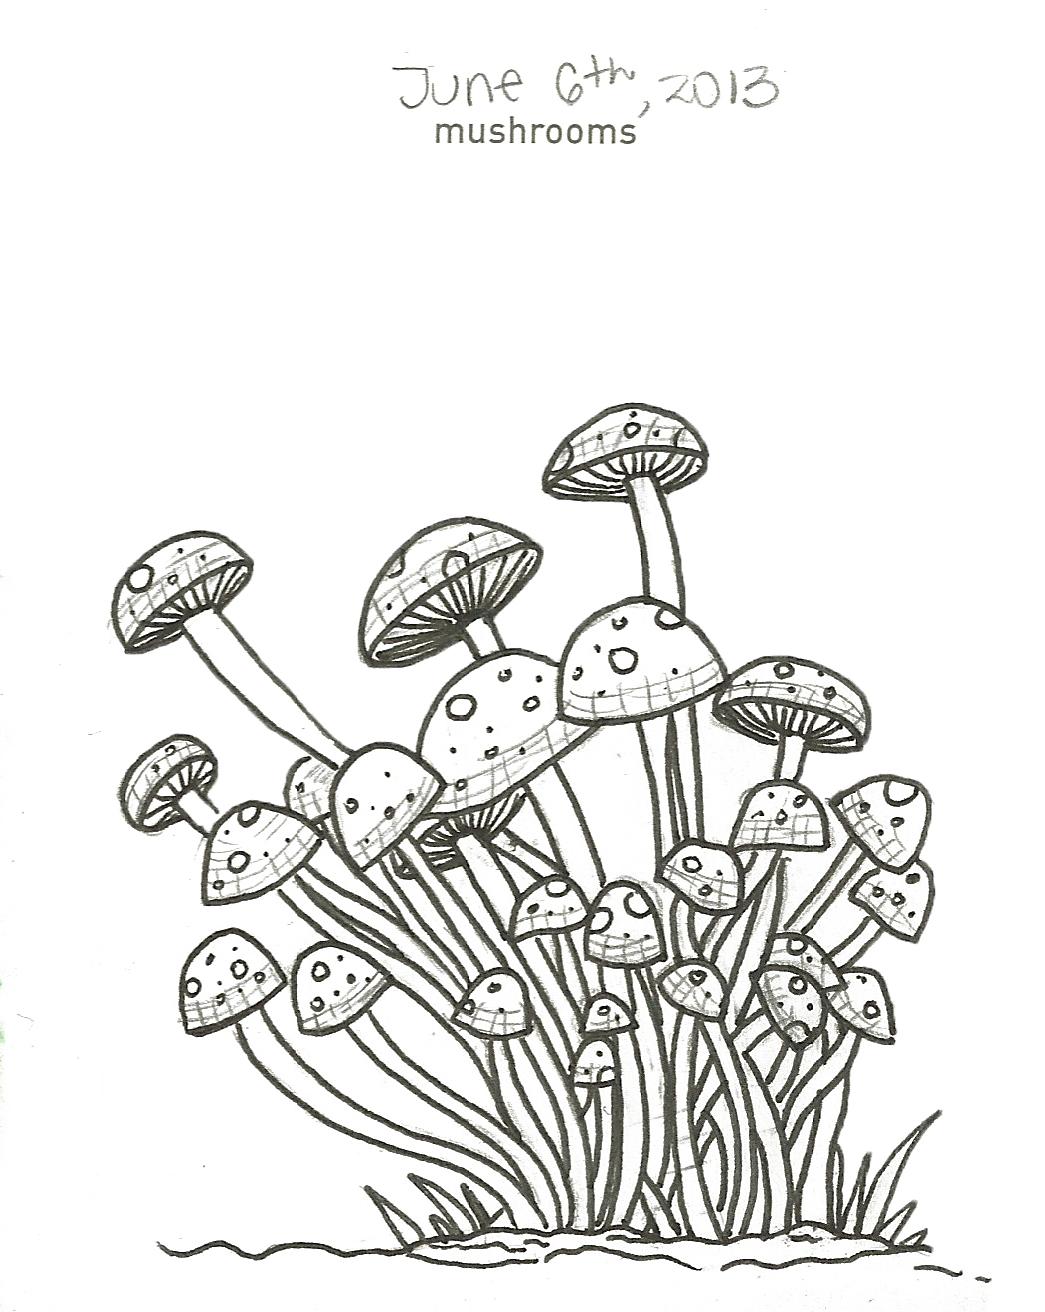 1045x1312 014 Mushrooms Doodle Company